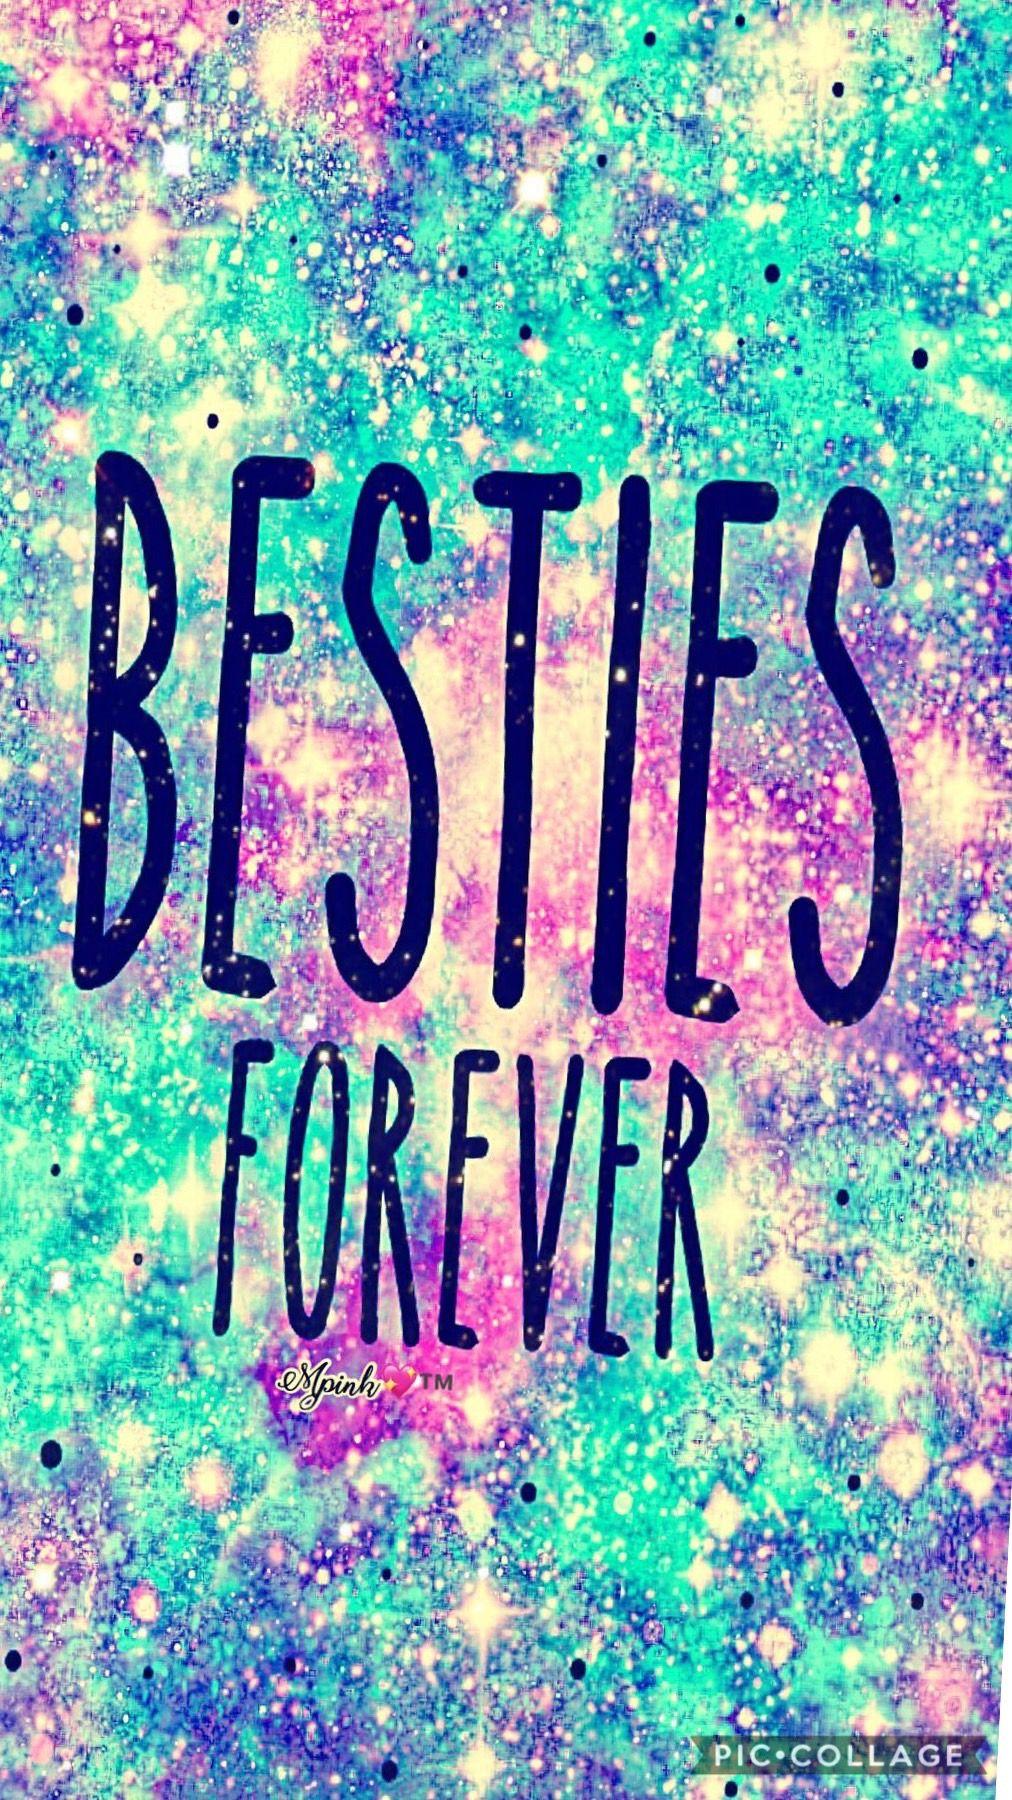 Best Friends Besties Forever Galaxy Wallpaper Best Friend Wallpaper